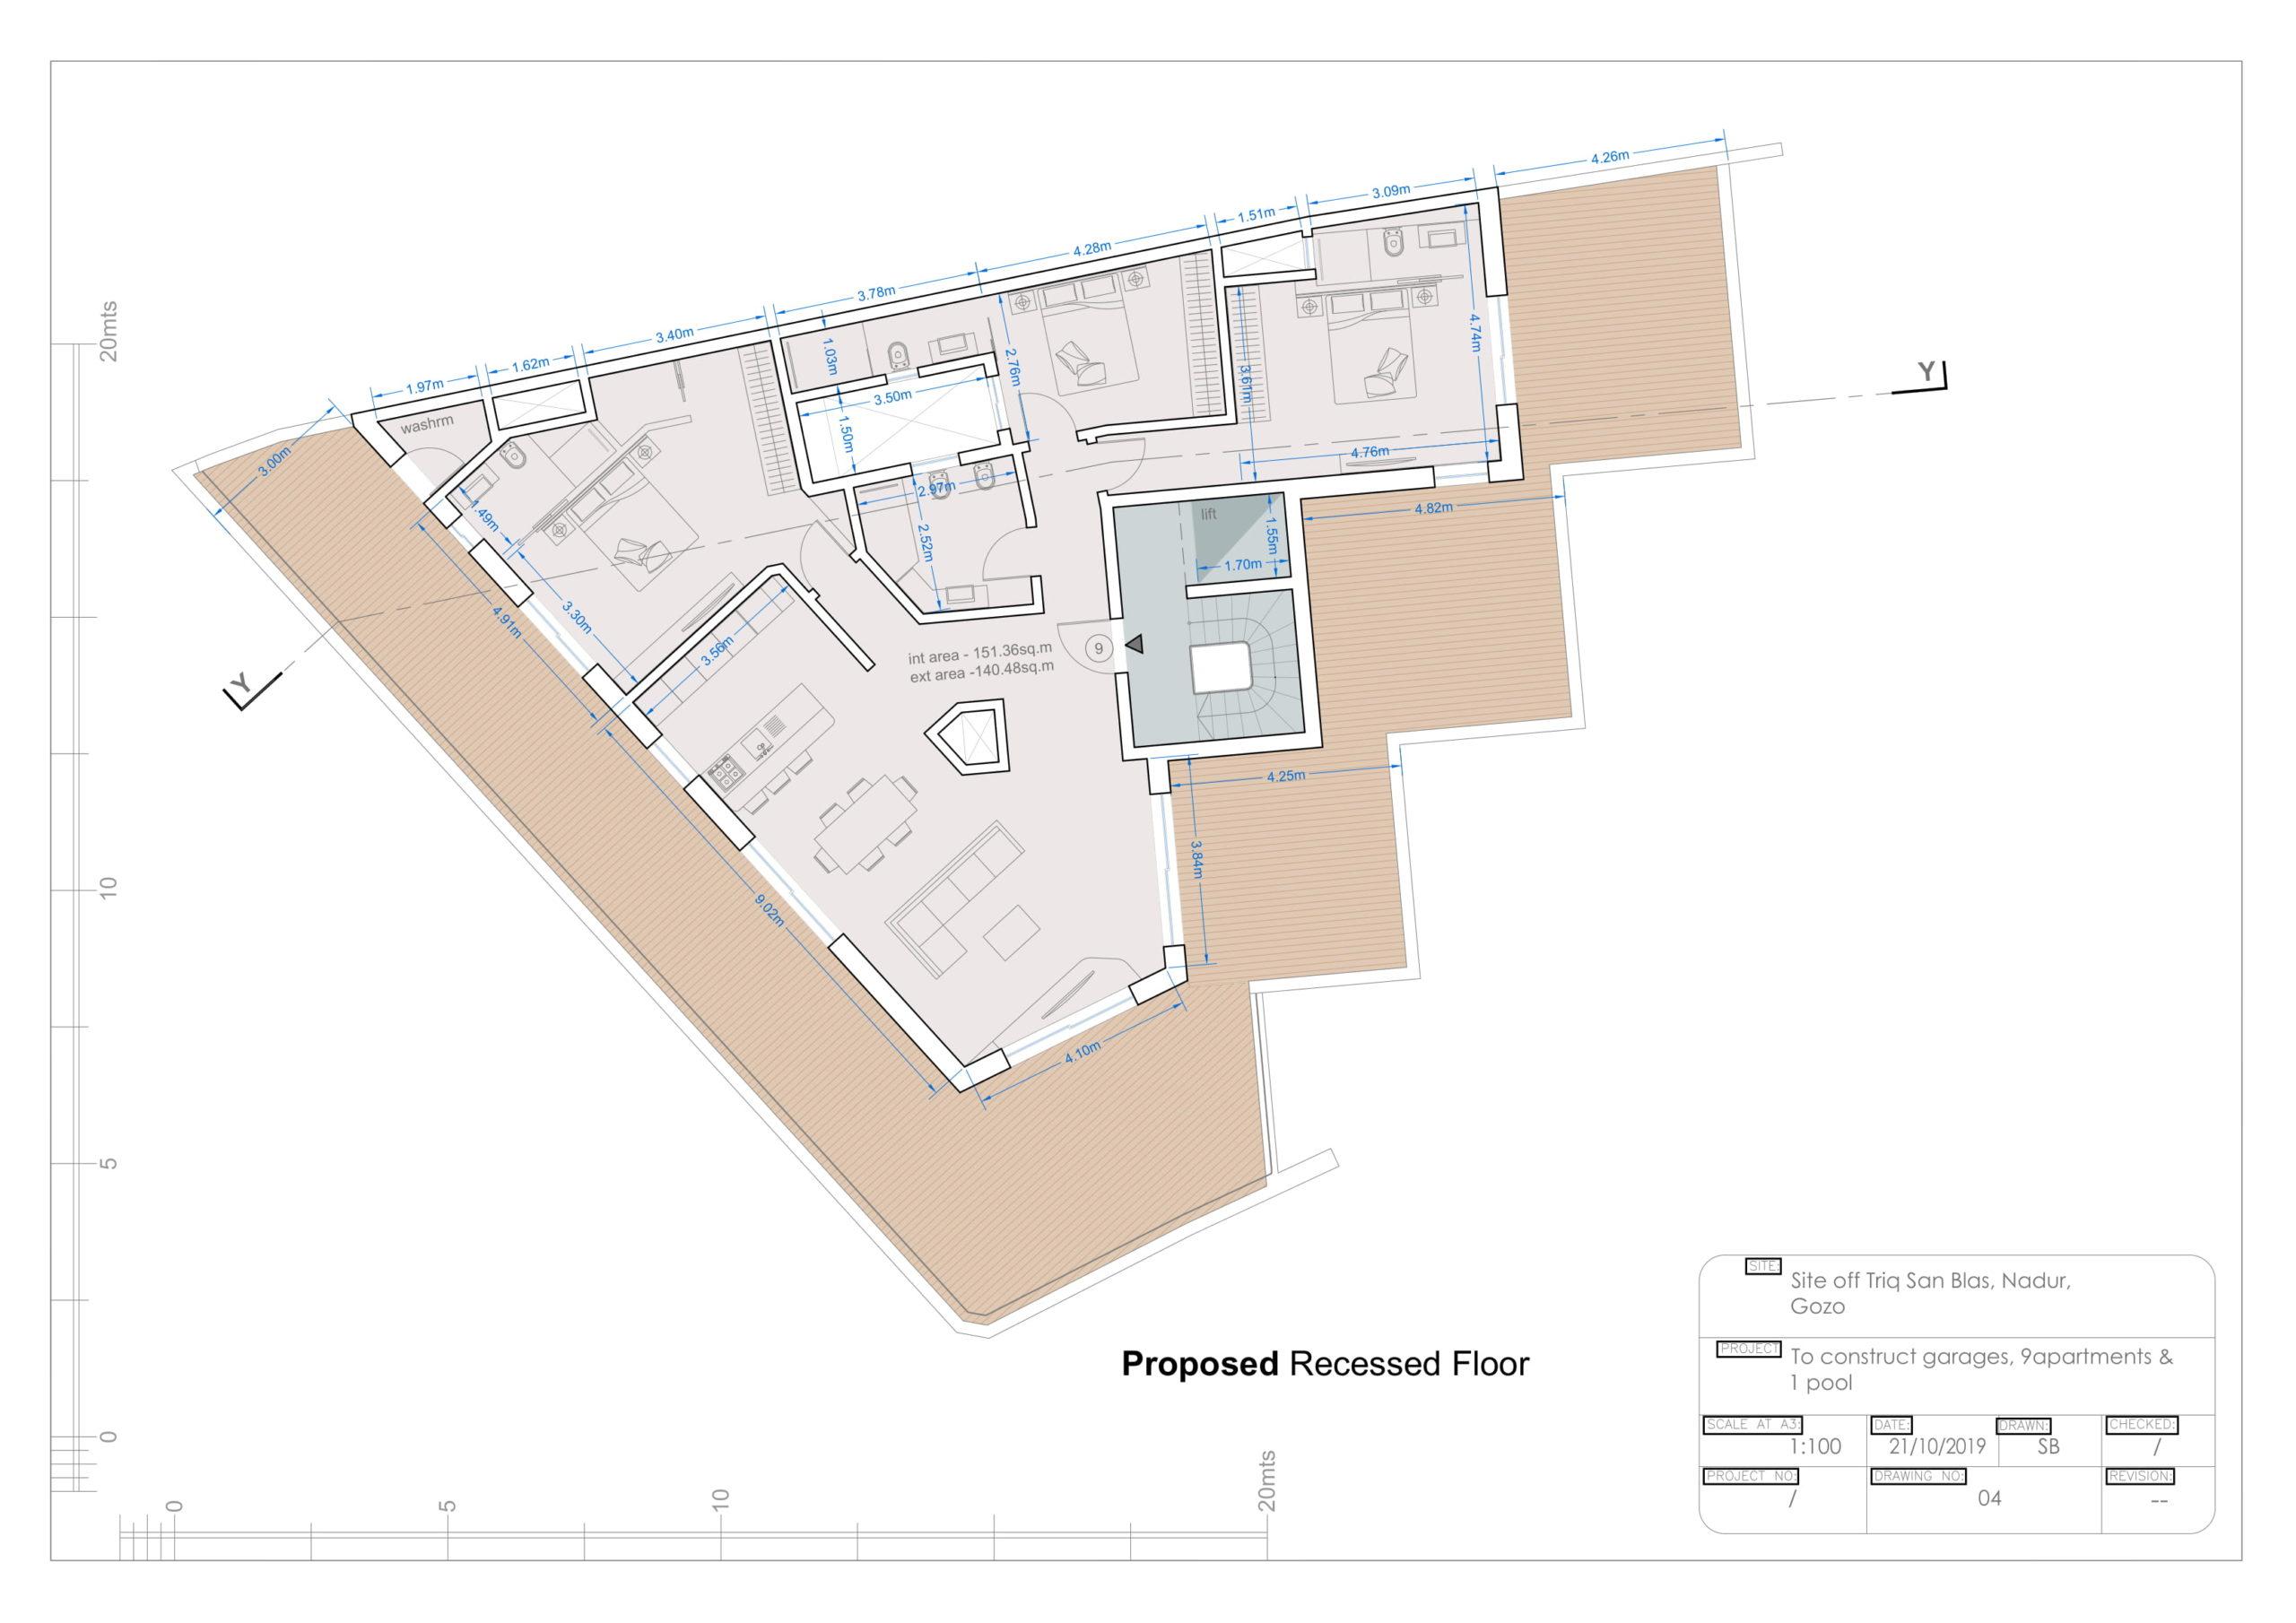 Dwg 04 - Proposed Recessed Floor Level-1 2